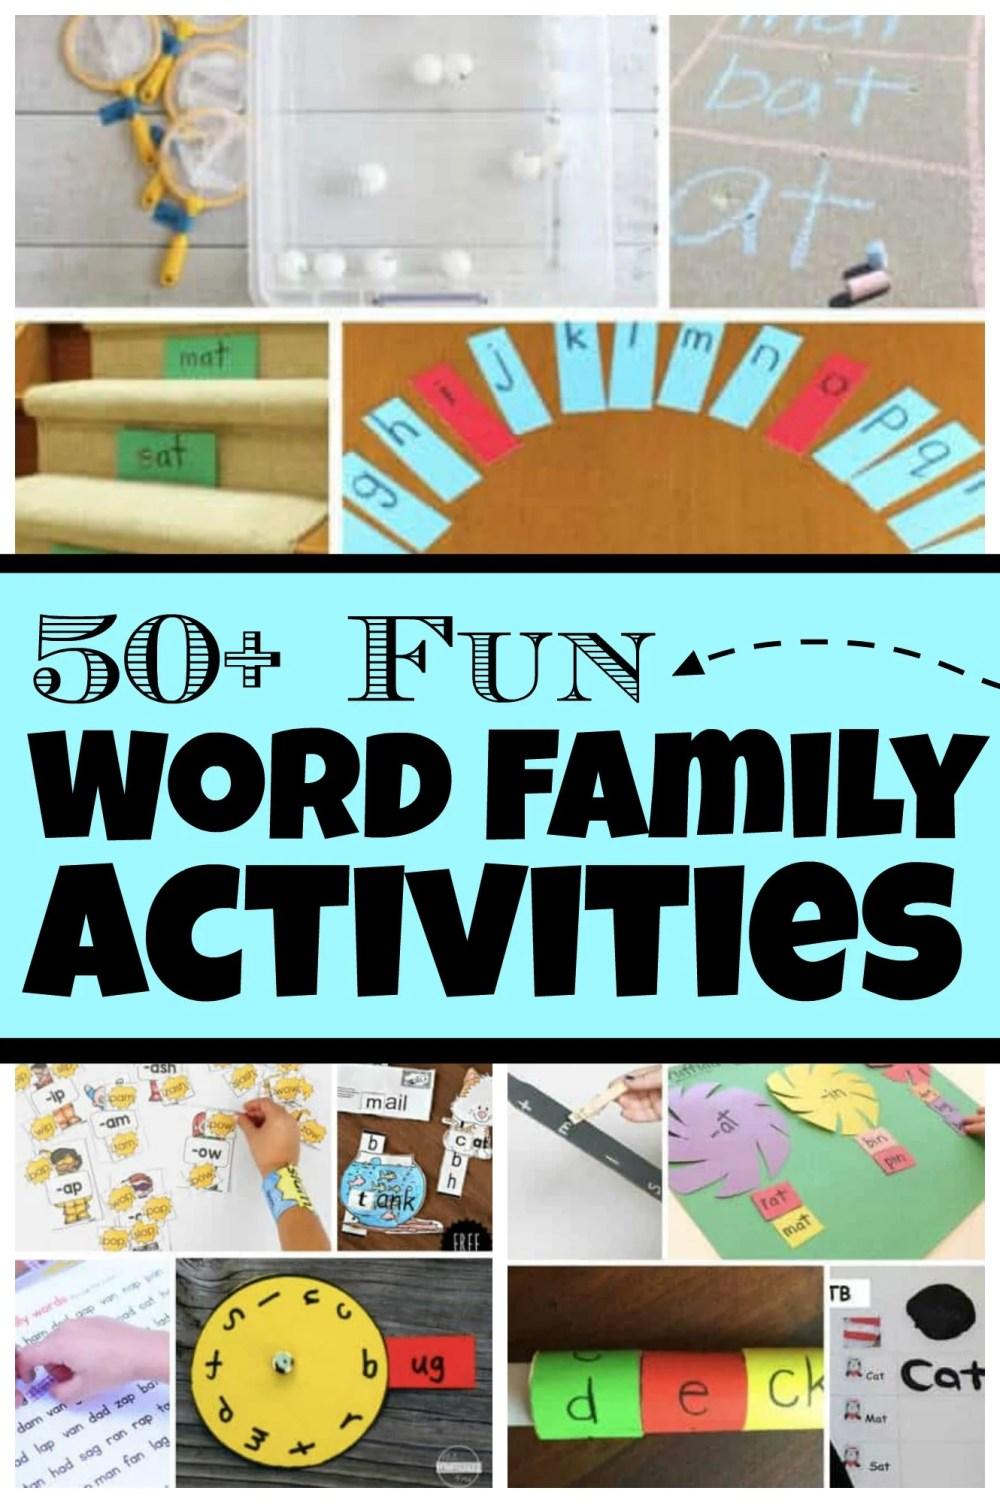 medium resolution of 50+ FUN Word Family Activities